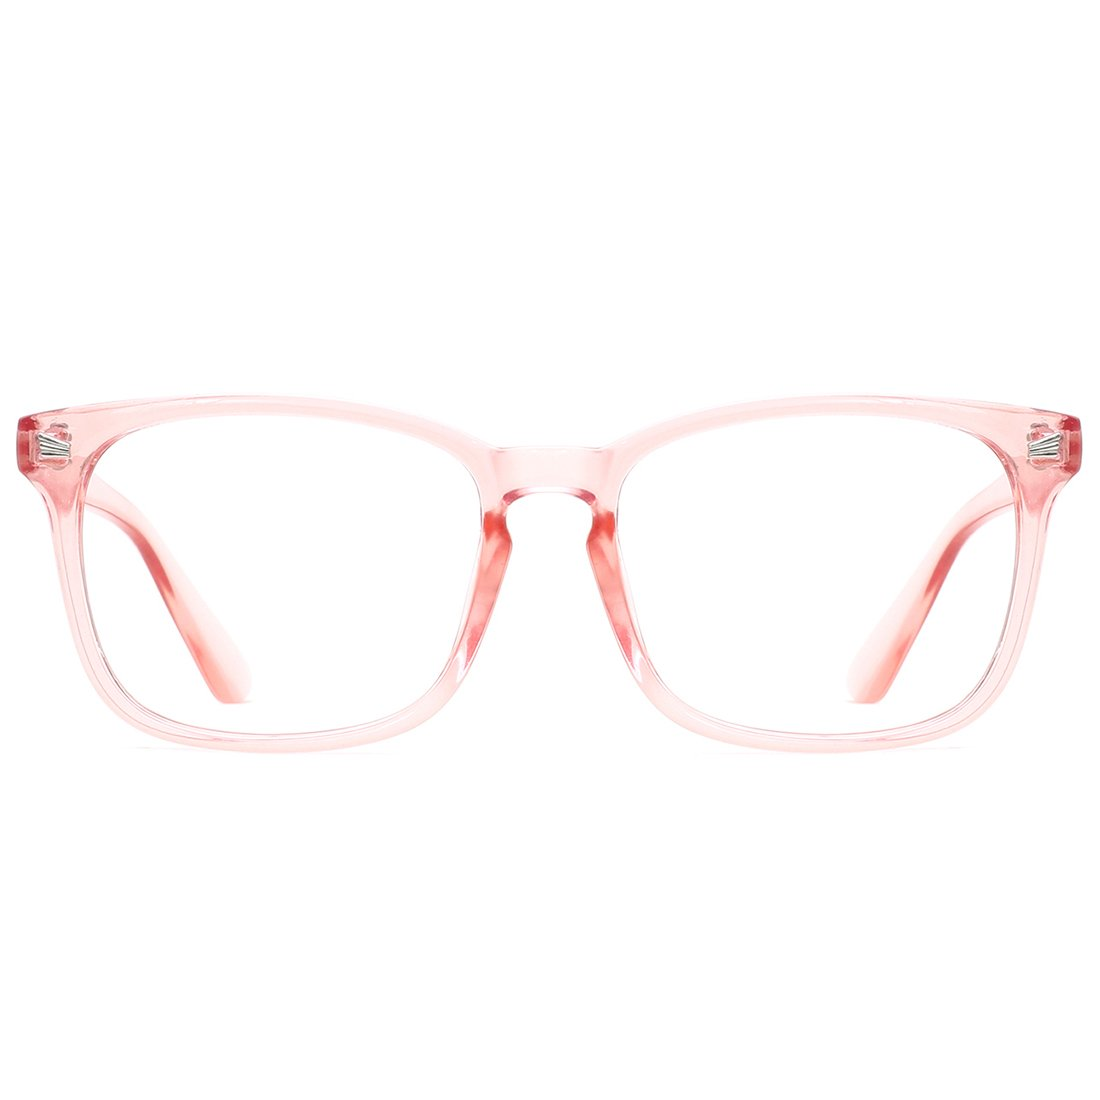 TIJN Blocking Glasses Eyeglasses Computer